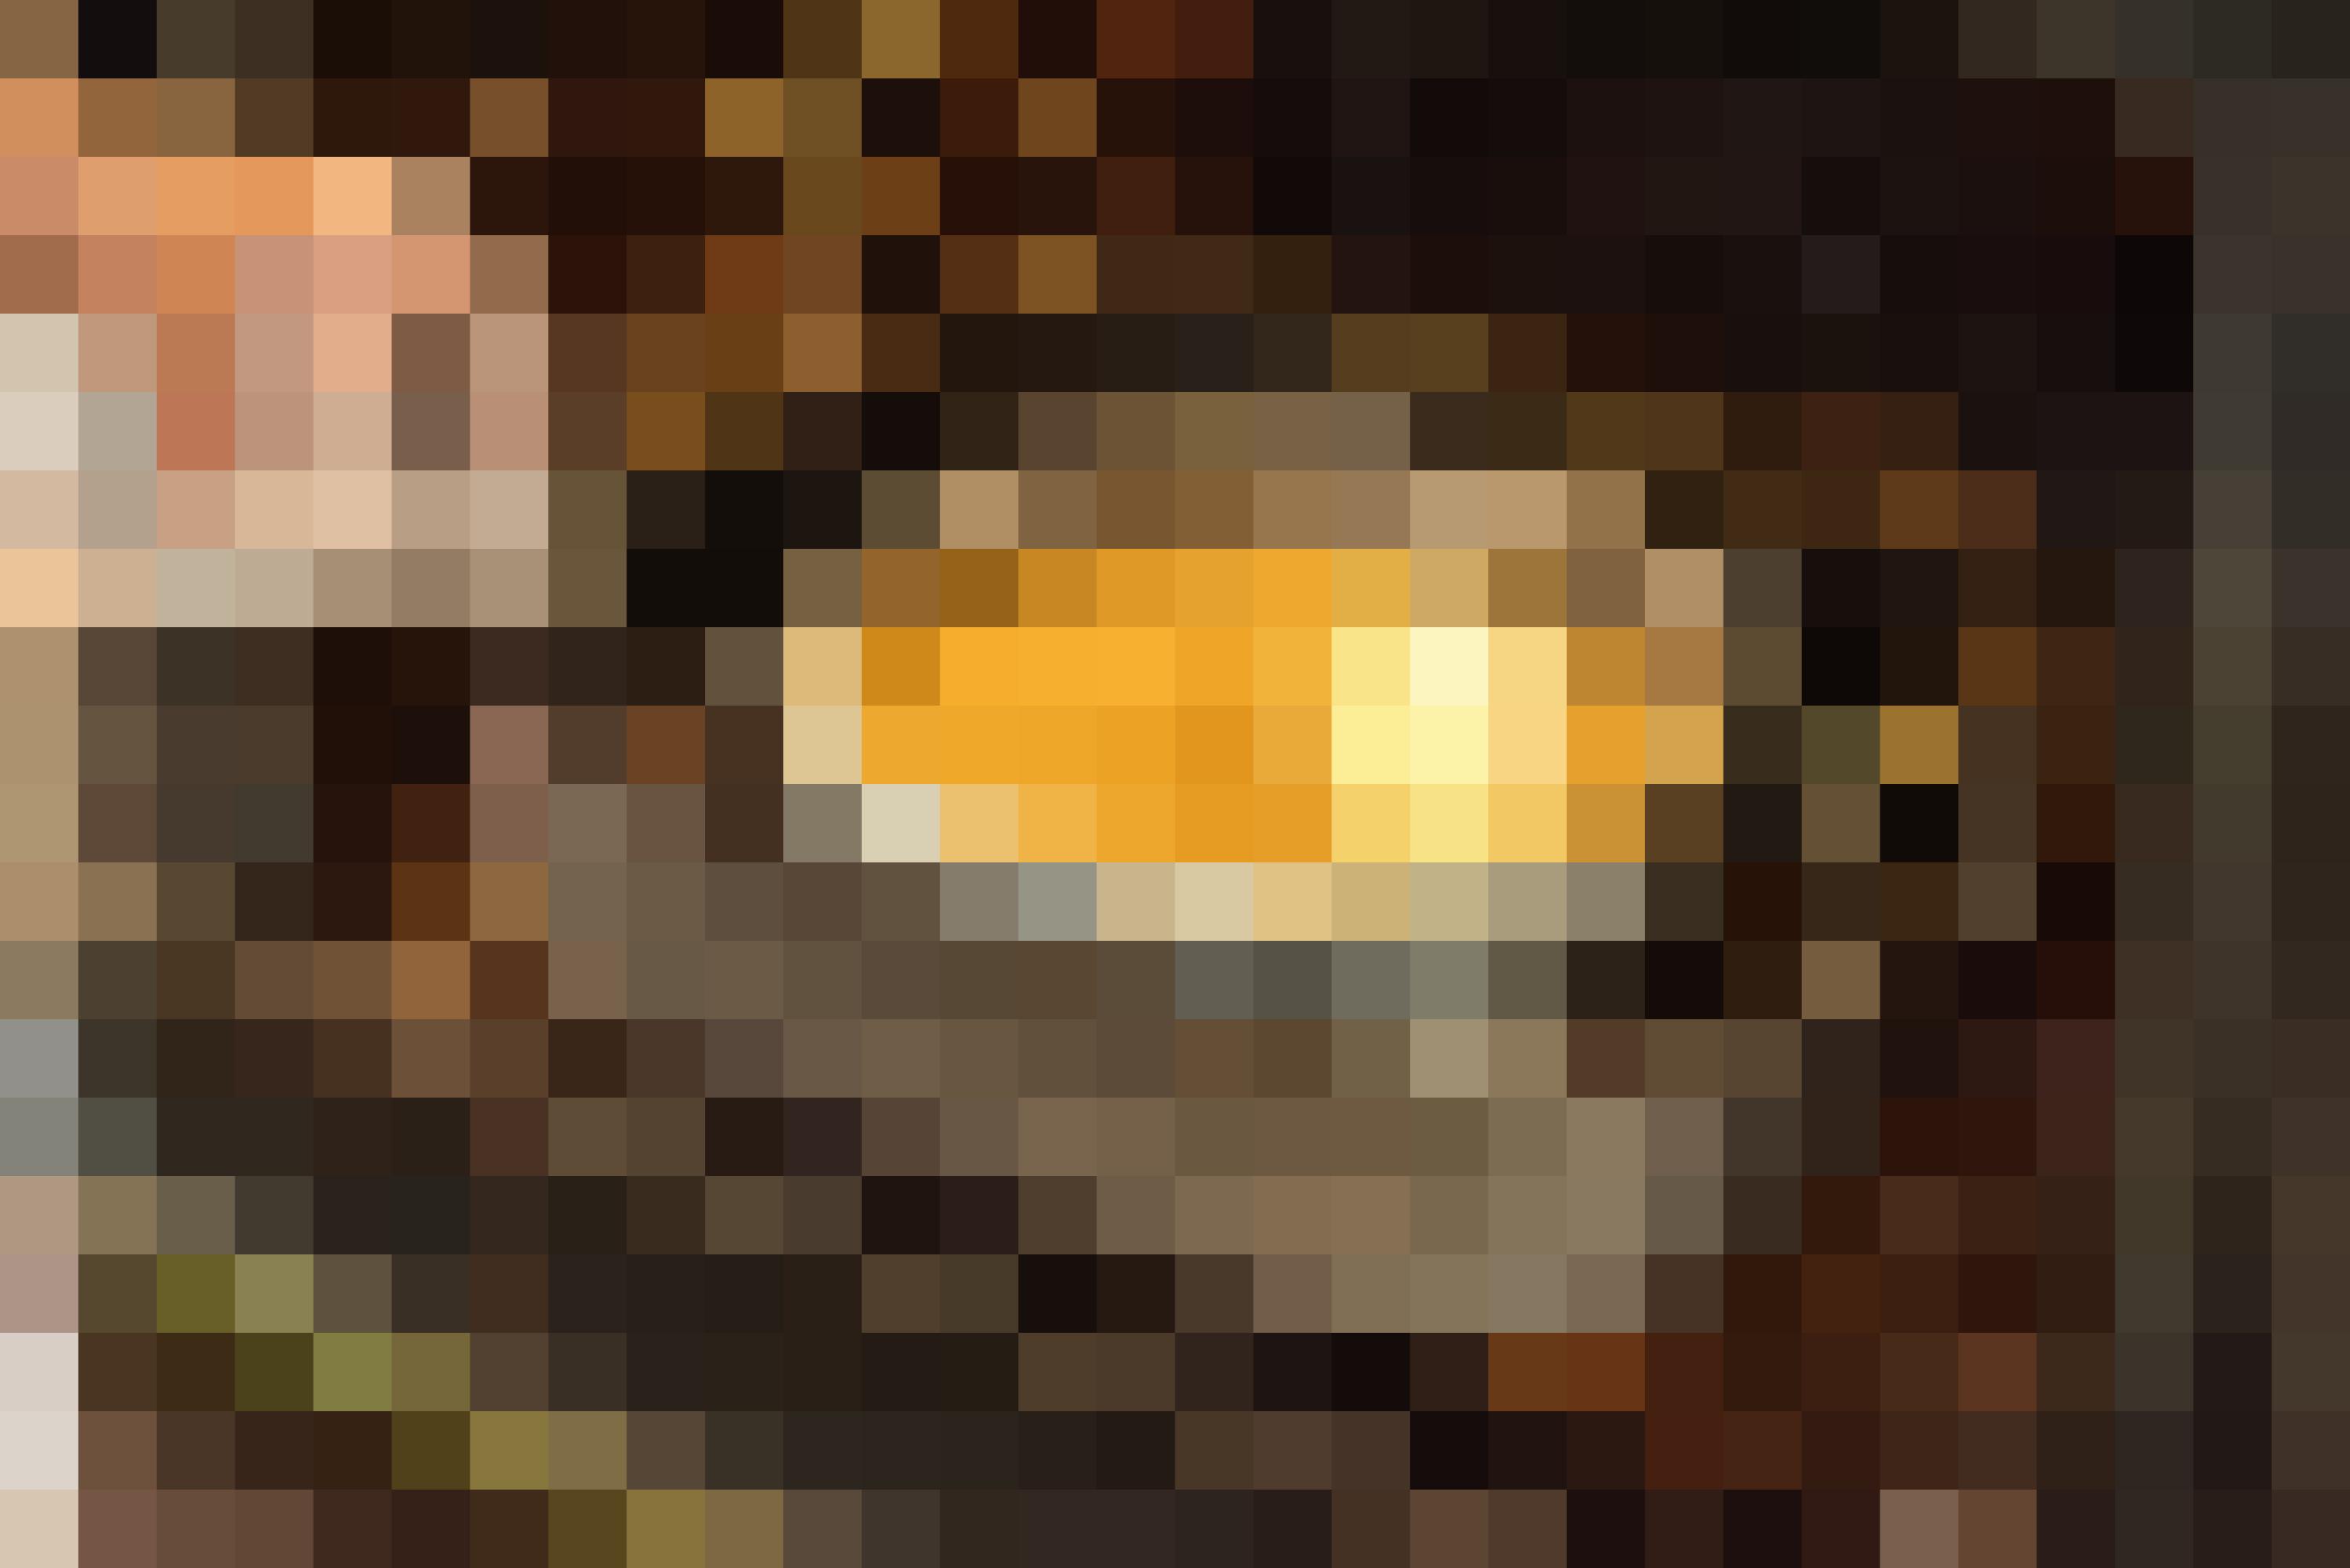 How To Make Pumpkin Cheesecake: gallery image 10